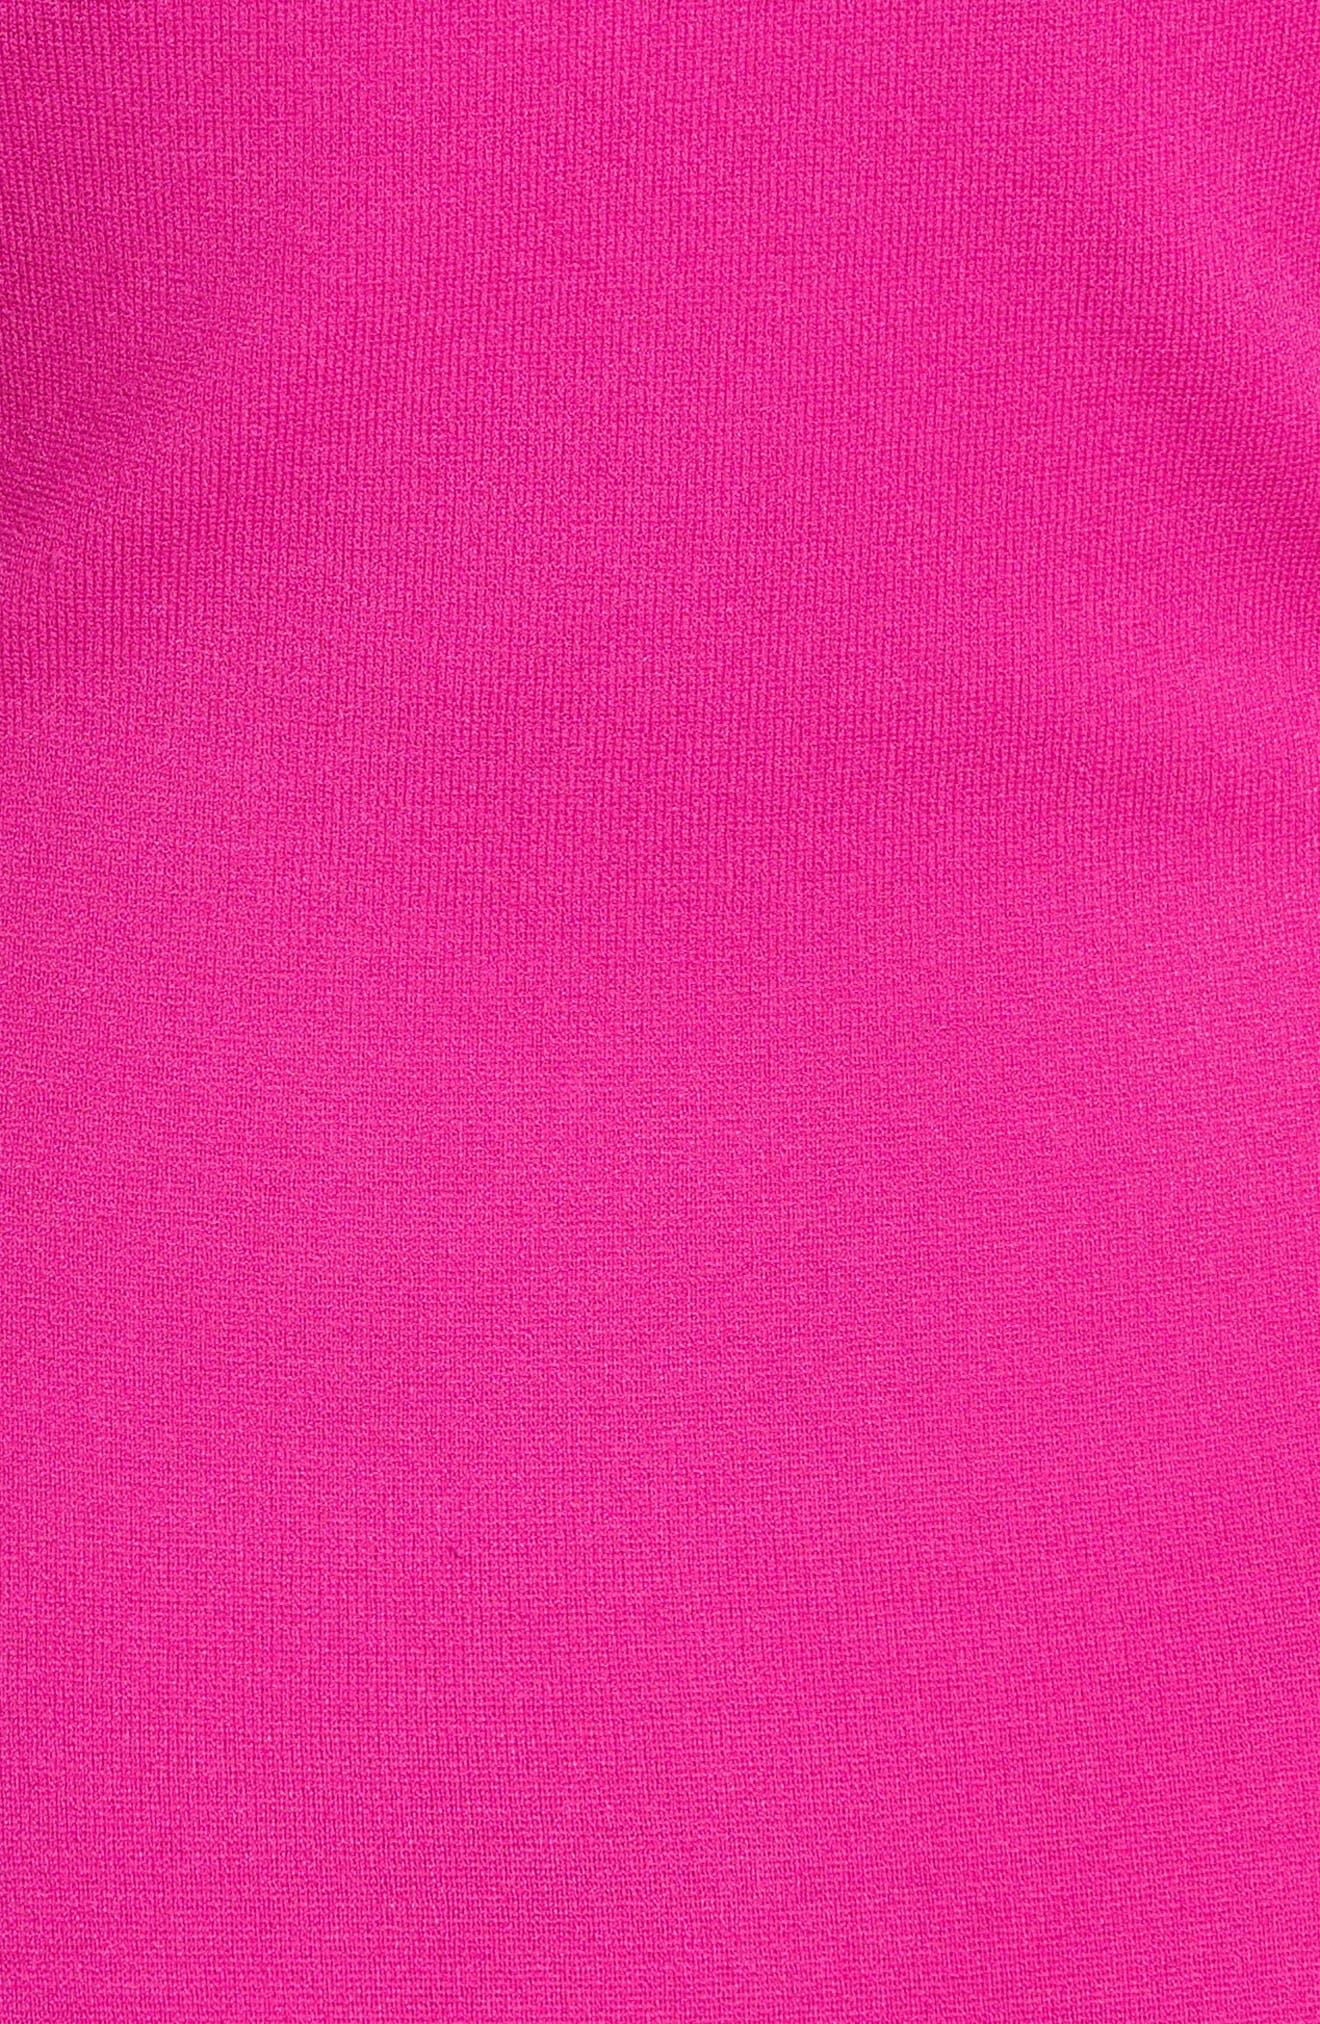 Diane von Furstenberg Knit One-Shoulder Midi Dress,                             Alternate thumbnail 5, color,                             Ribbon Pink